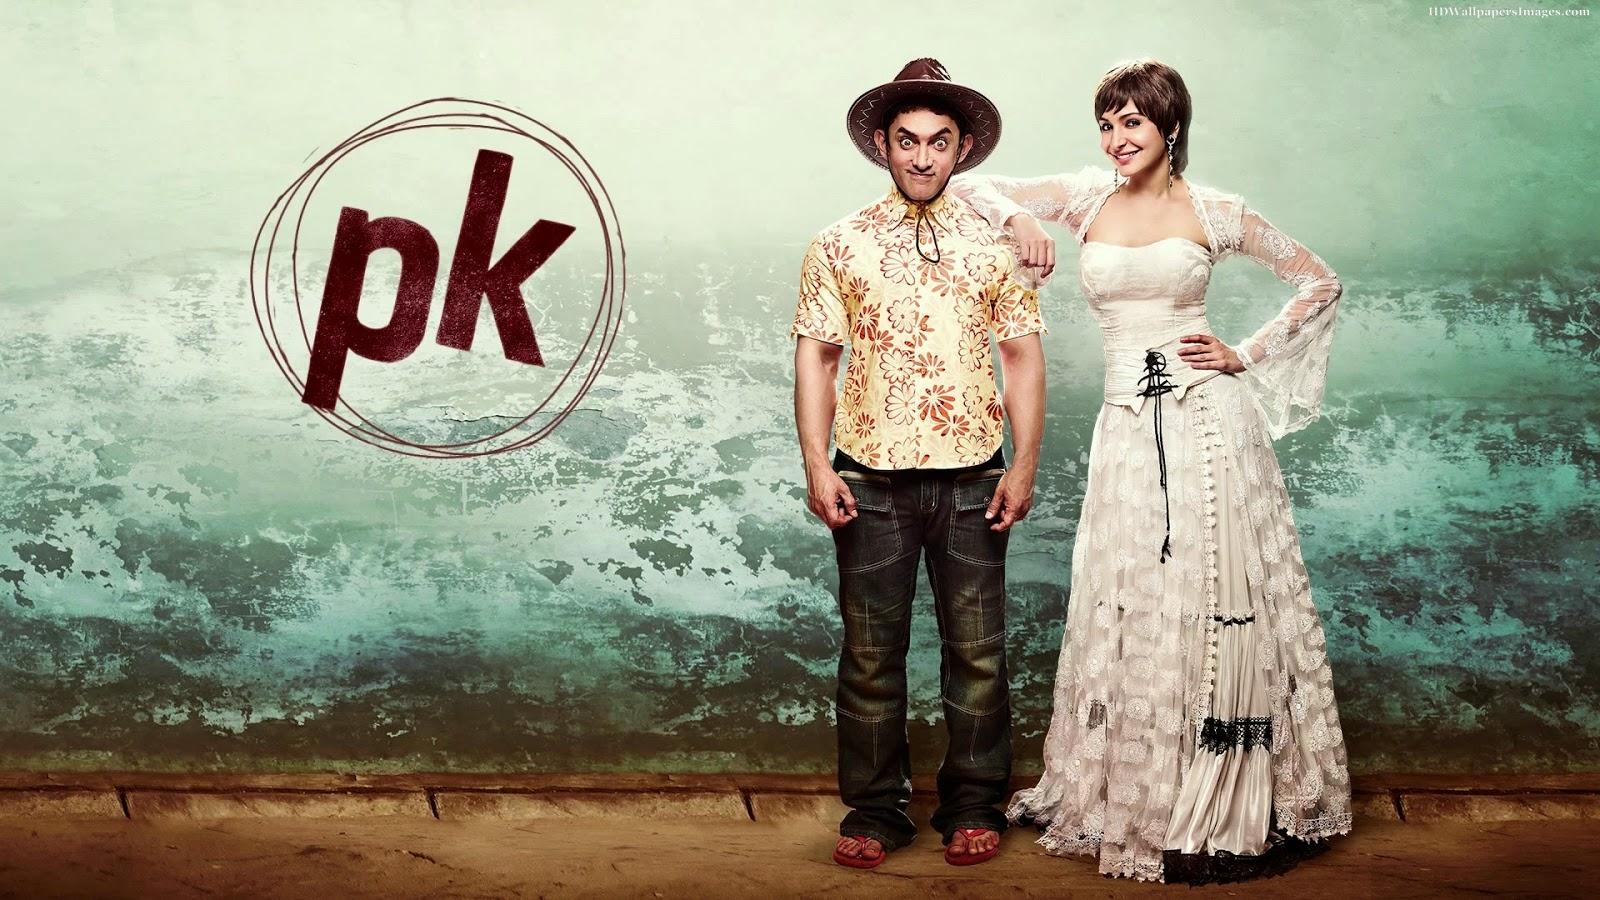 PK Full Indian Movie Download HD Free Bollywood film | Aamir Khan | Rajkumar Hirani